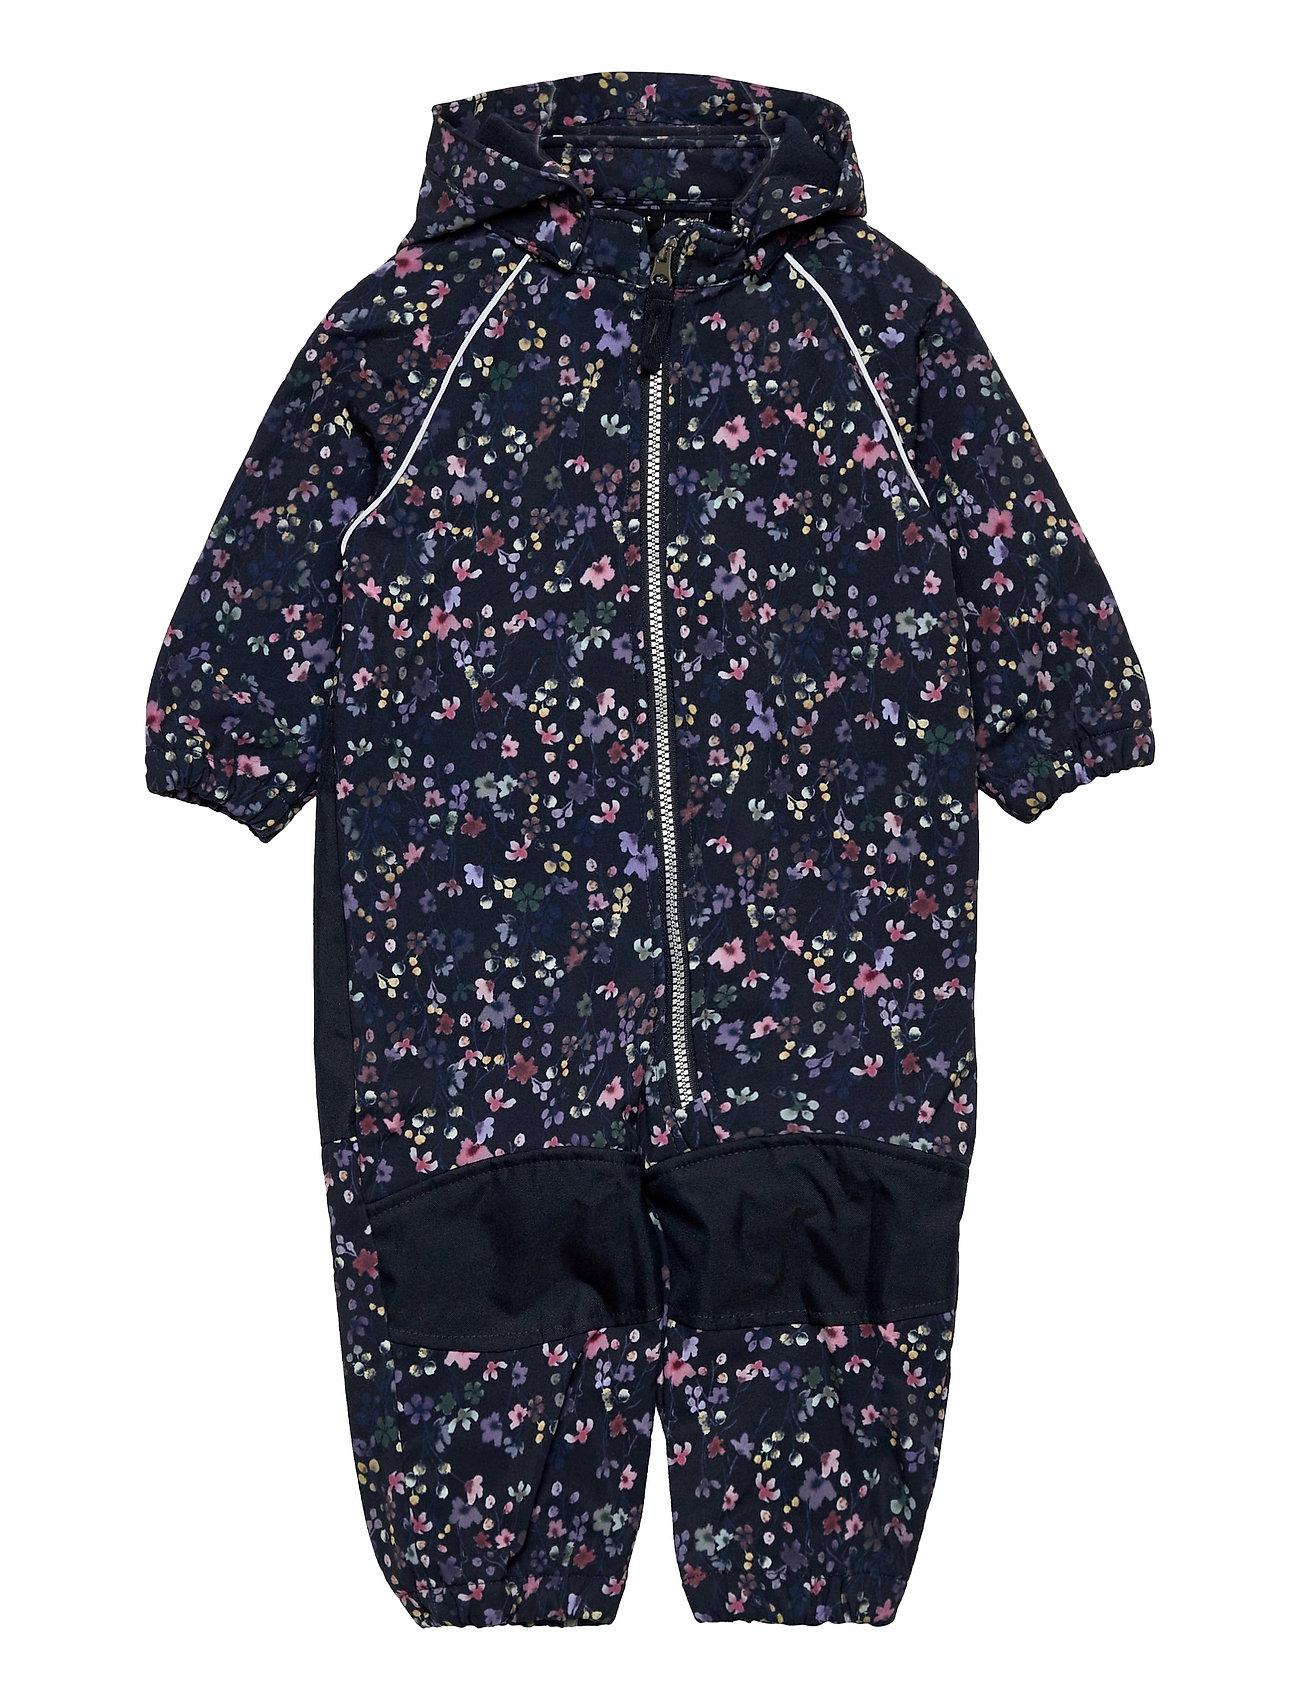 Nmfalfa Suit Wild Flower Fo Outerwear Rainwear Sets & Coveralls Blå Name It